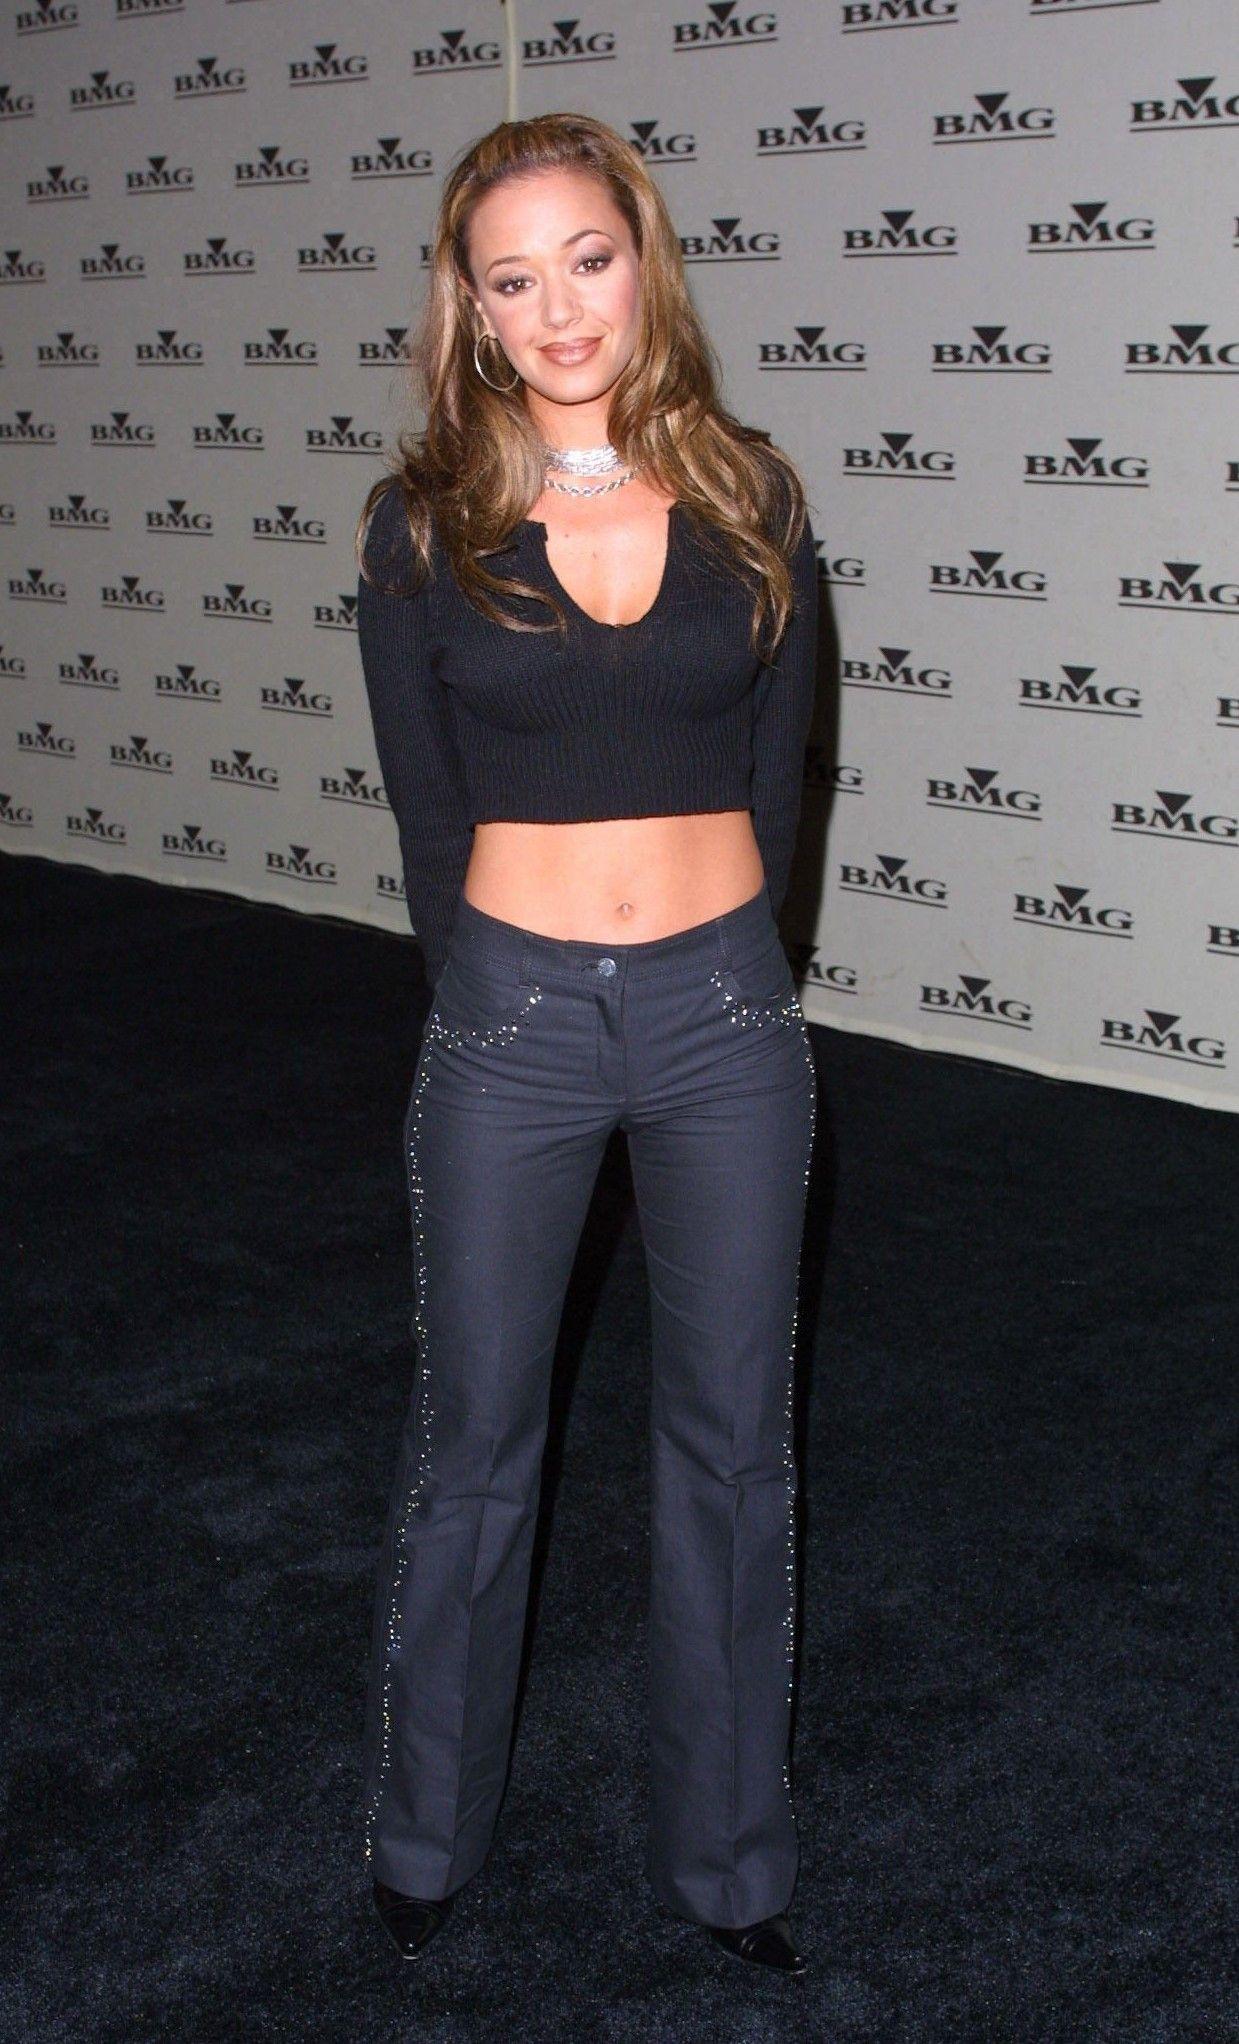 Leah Remini | Leah remini, Leah, Celebrities female